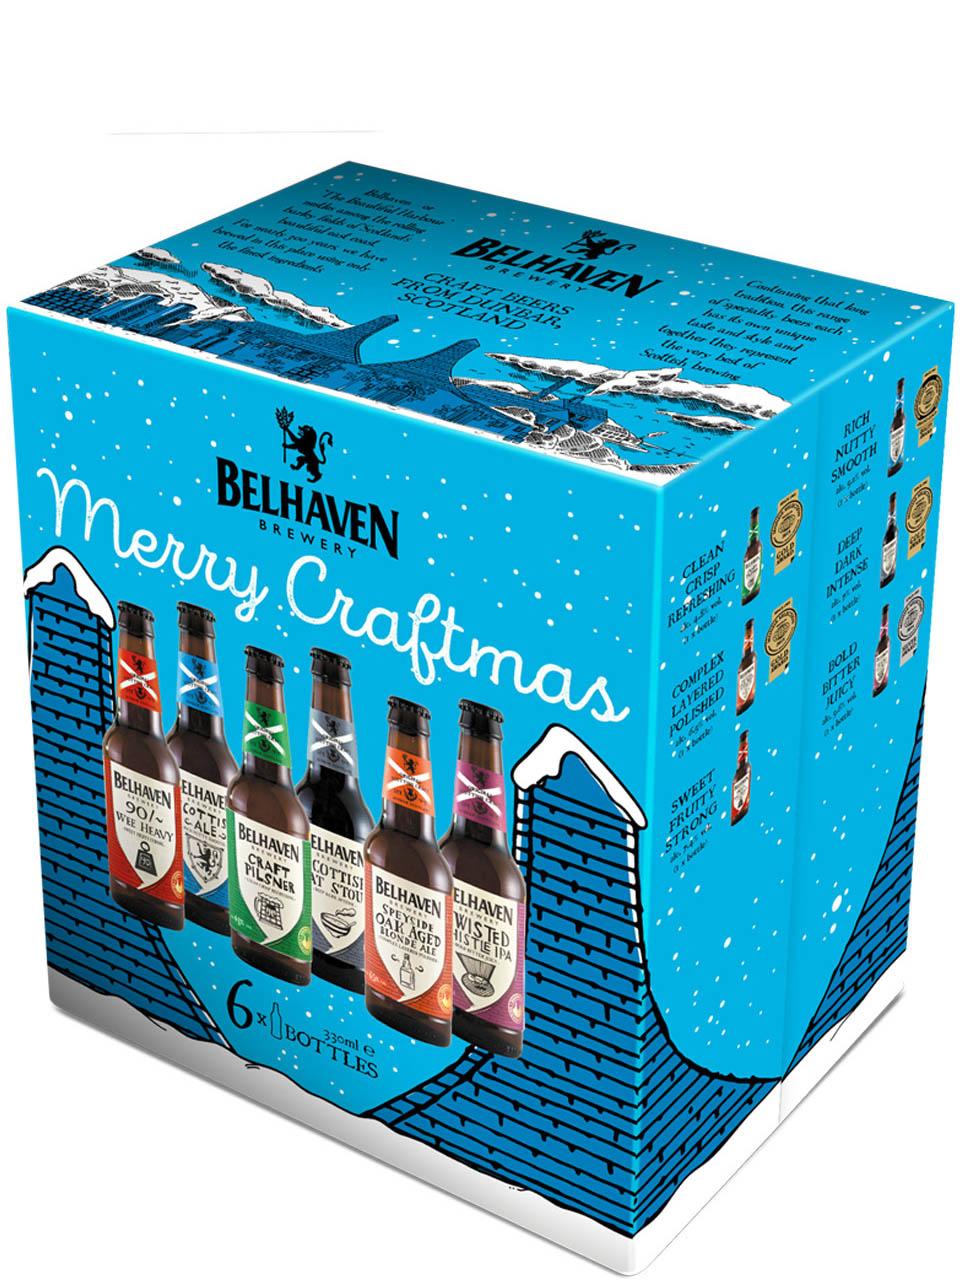 Belhaven Brewery Merry Craftmas 6 Pack Bottles